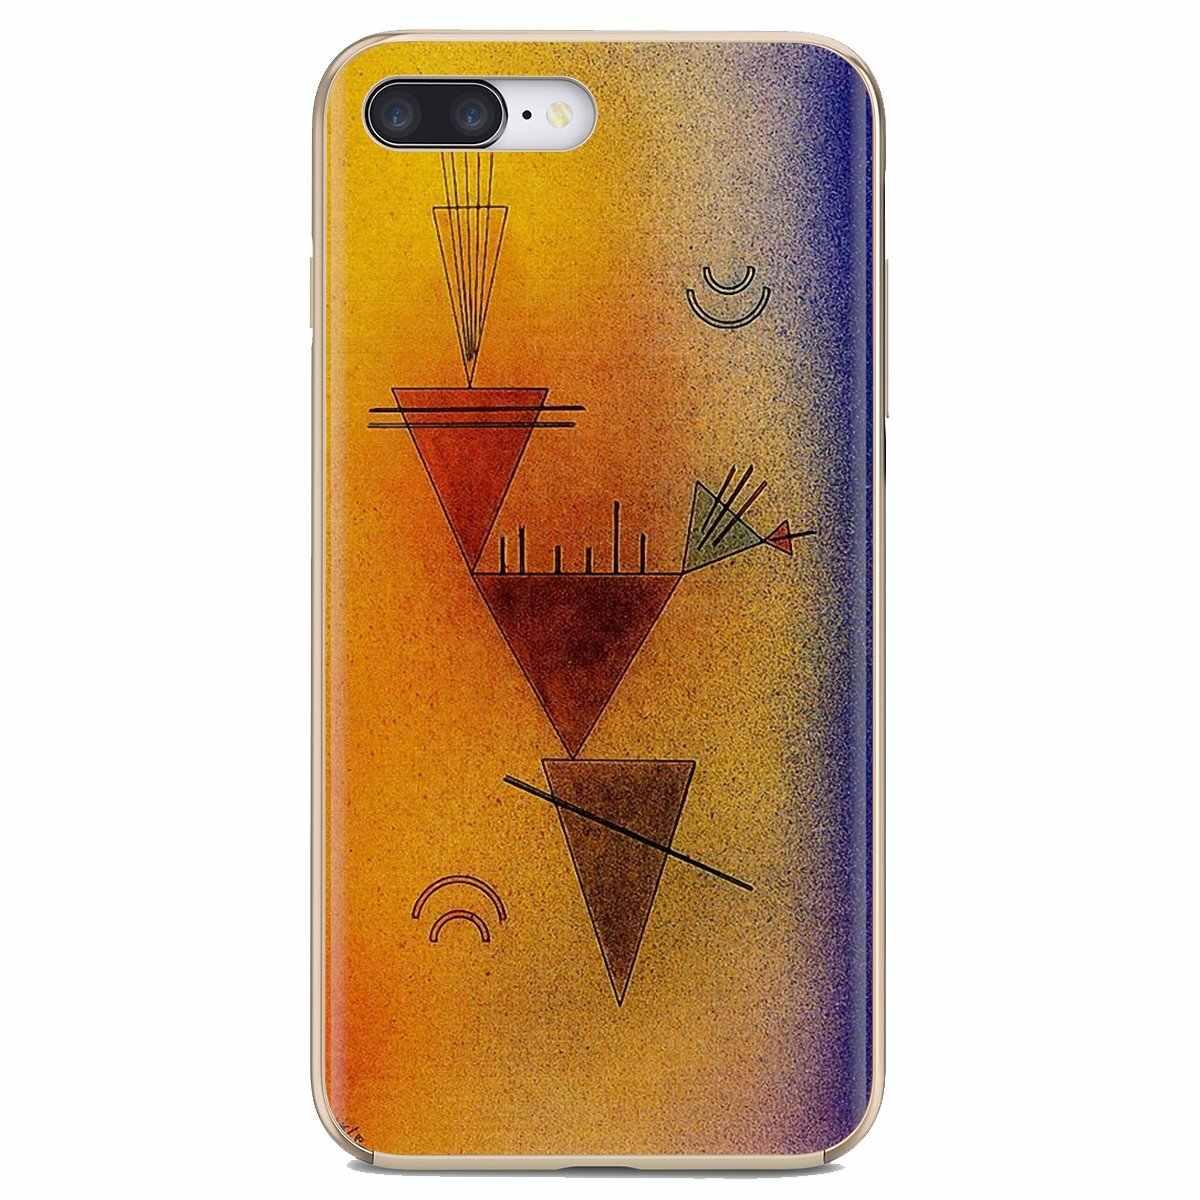 Soft TPU Case Geo artistic geometry artist Poster For Samsung Galaxy Note 2 3 4 5 8 9 S2 S3 S4 S5 Mini S6 S7 Edge S8 S9 Plus